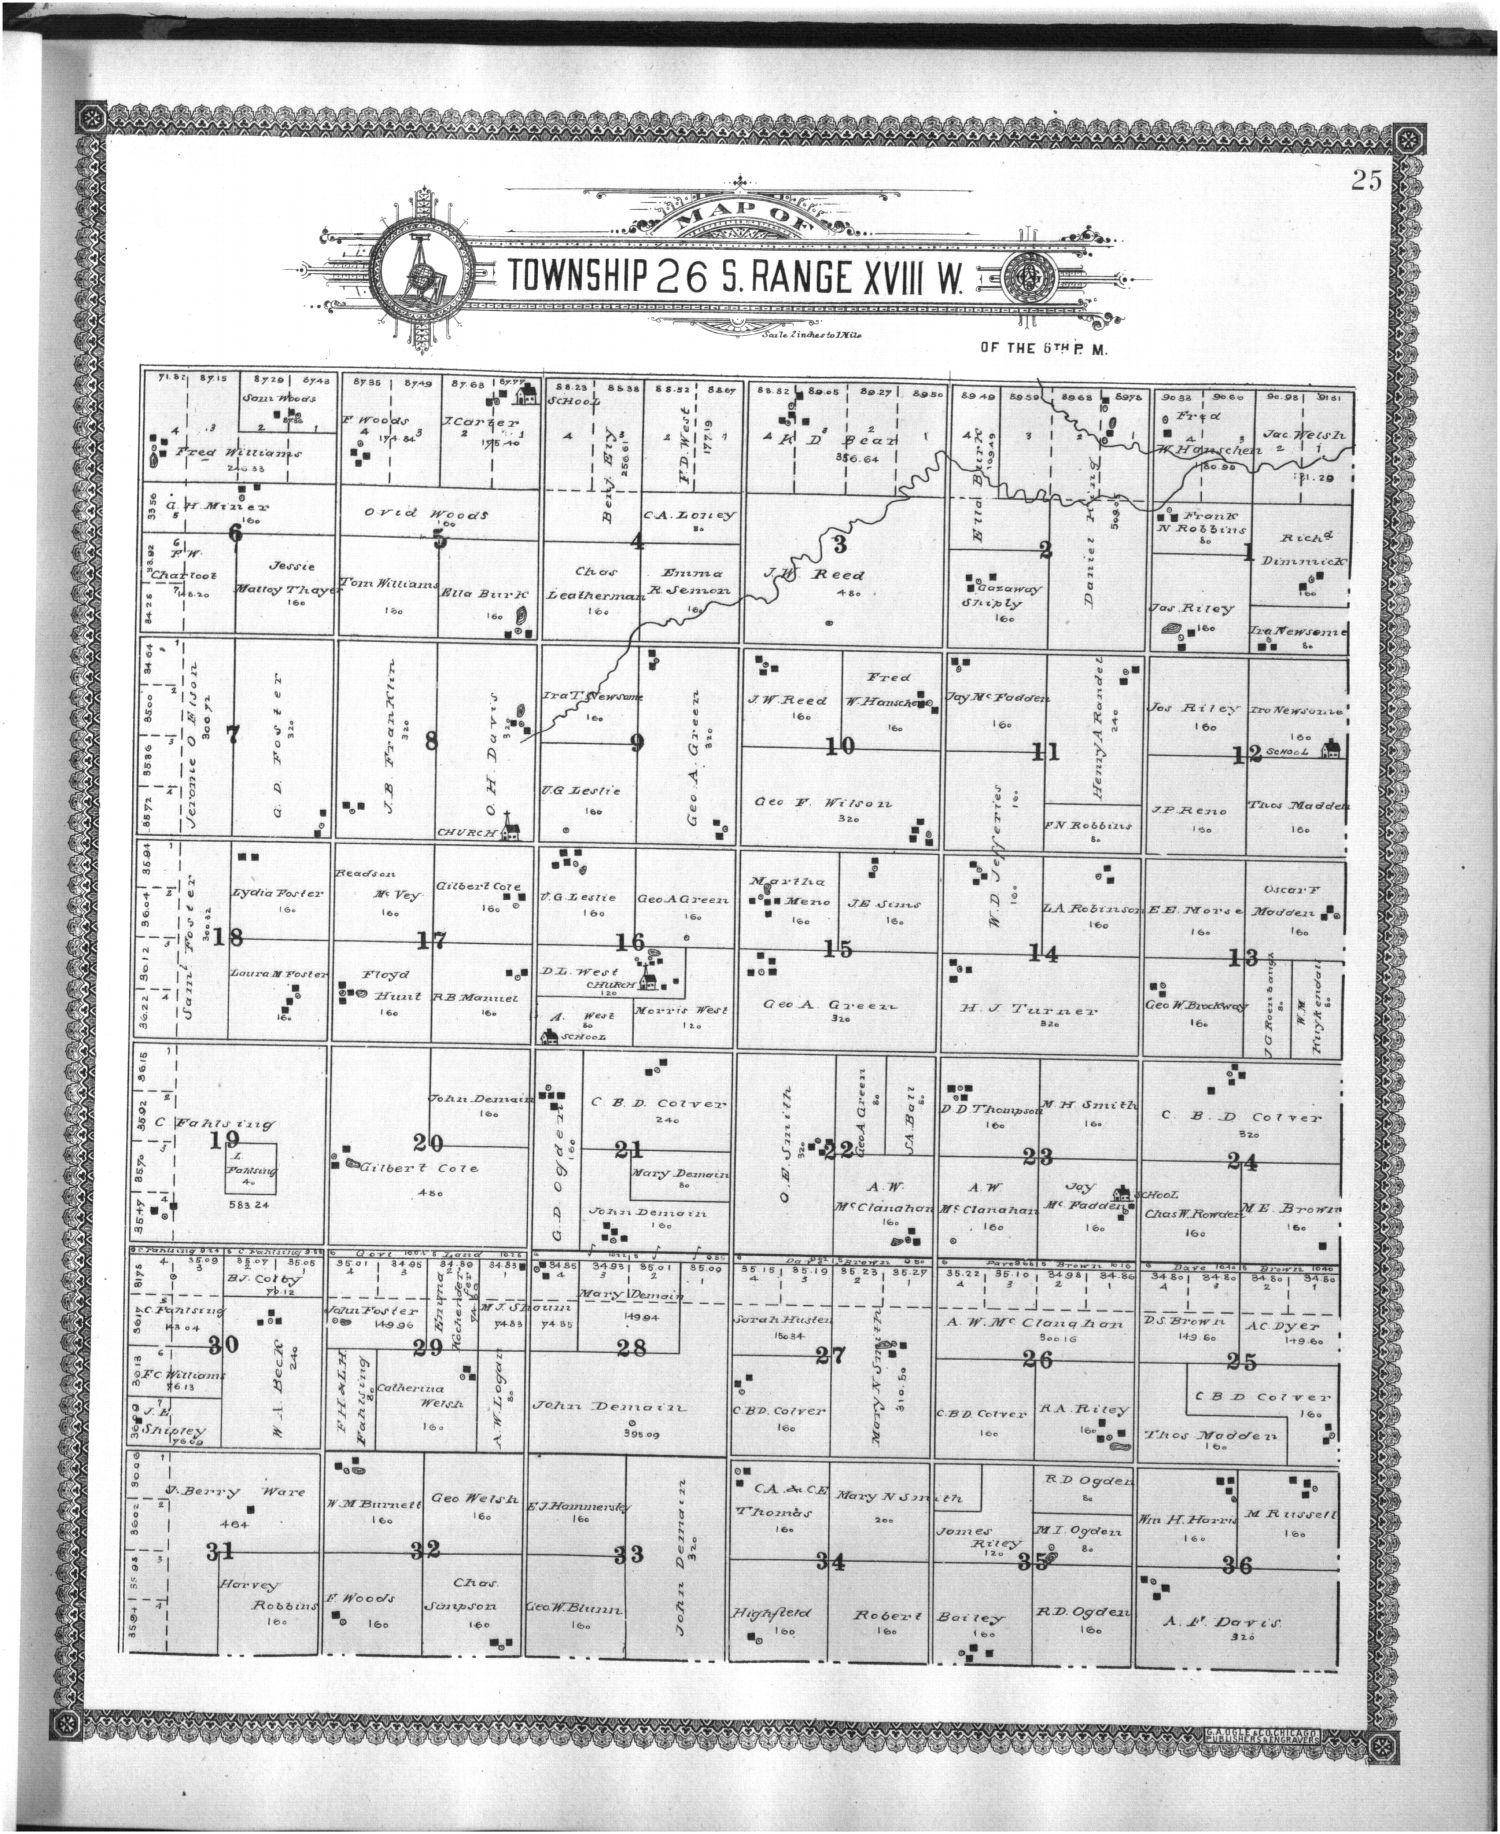 Standard atlas of Edwards County - 25